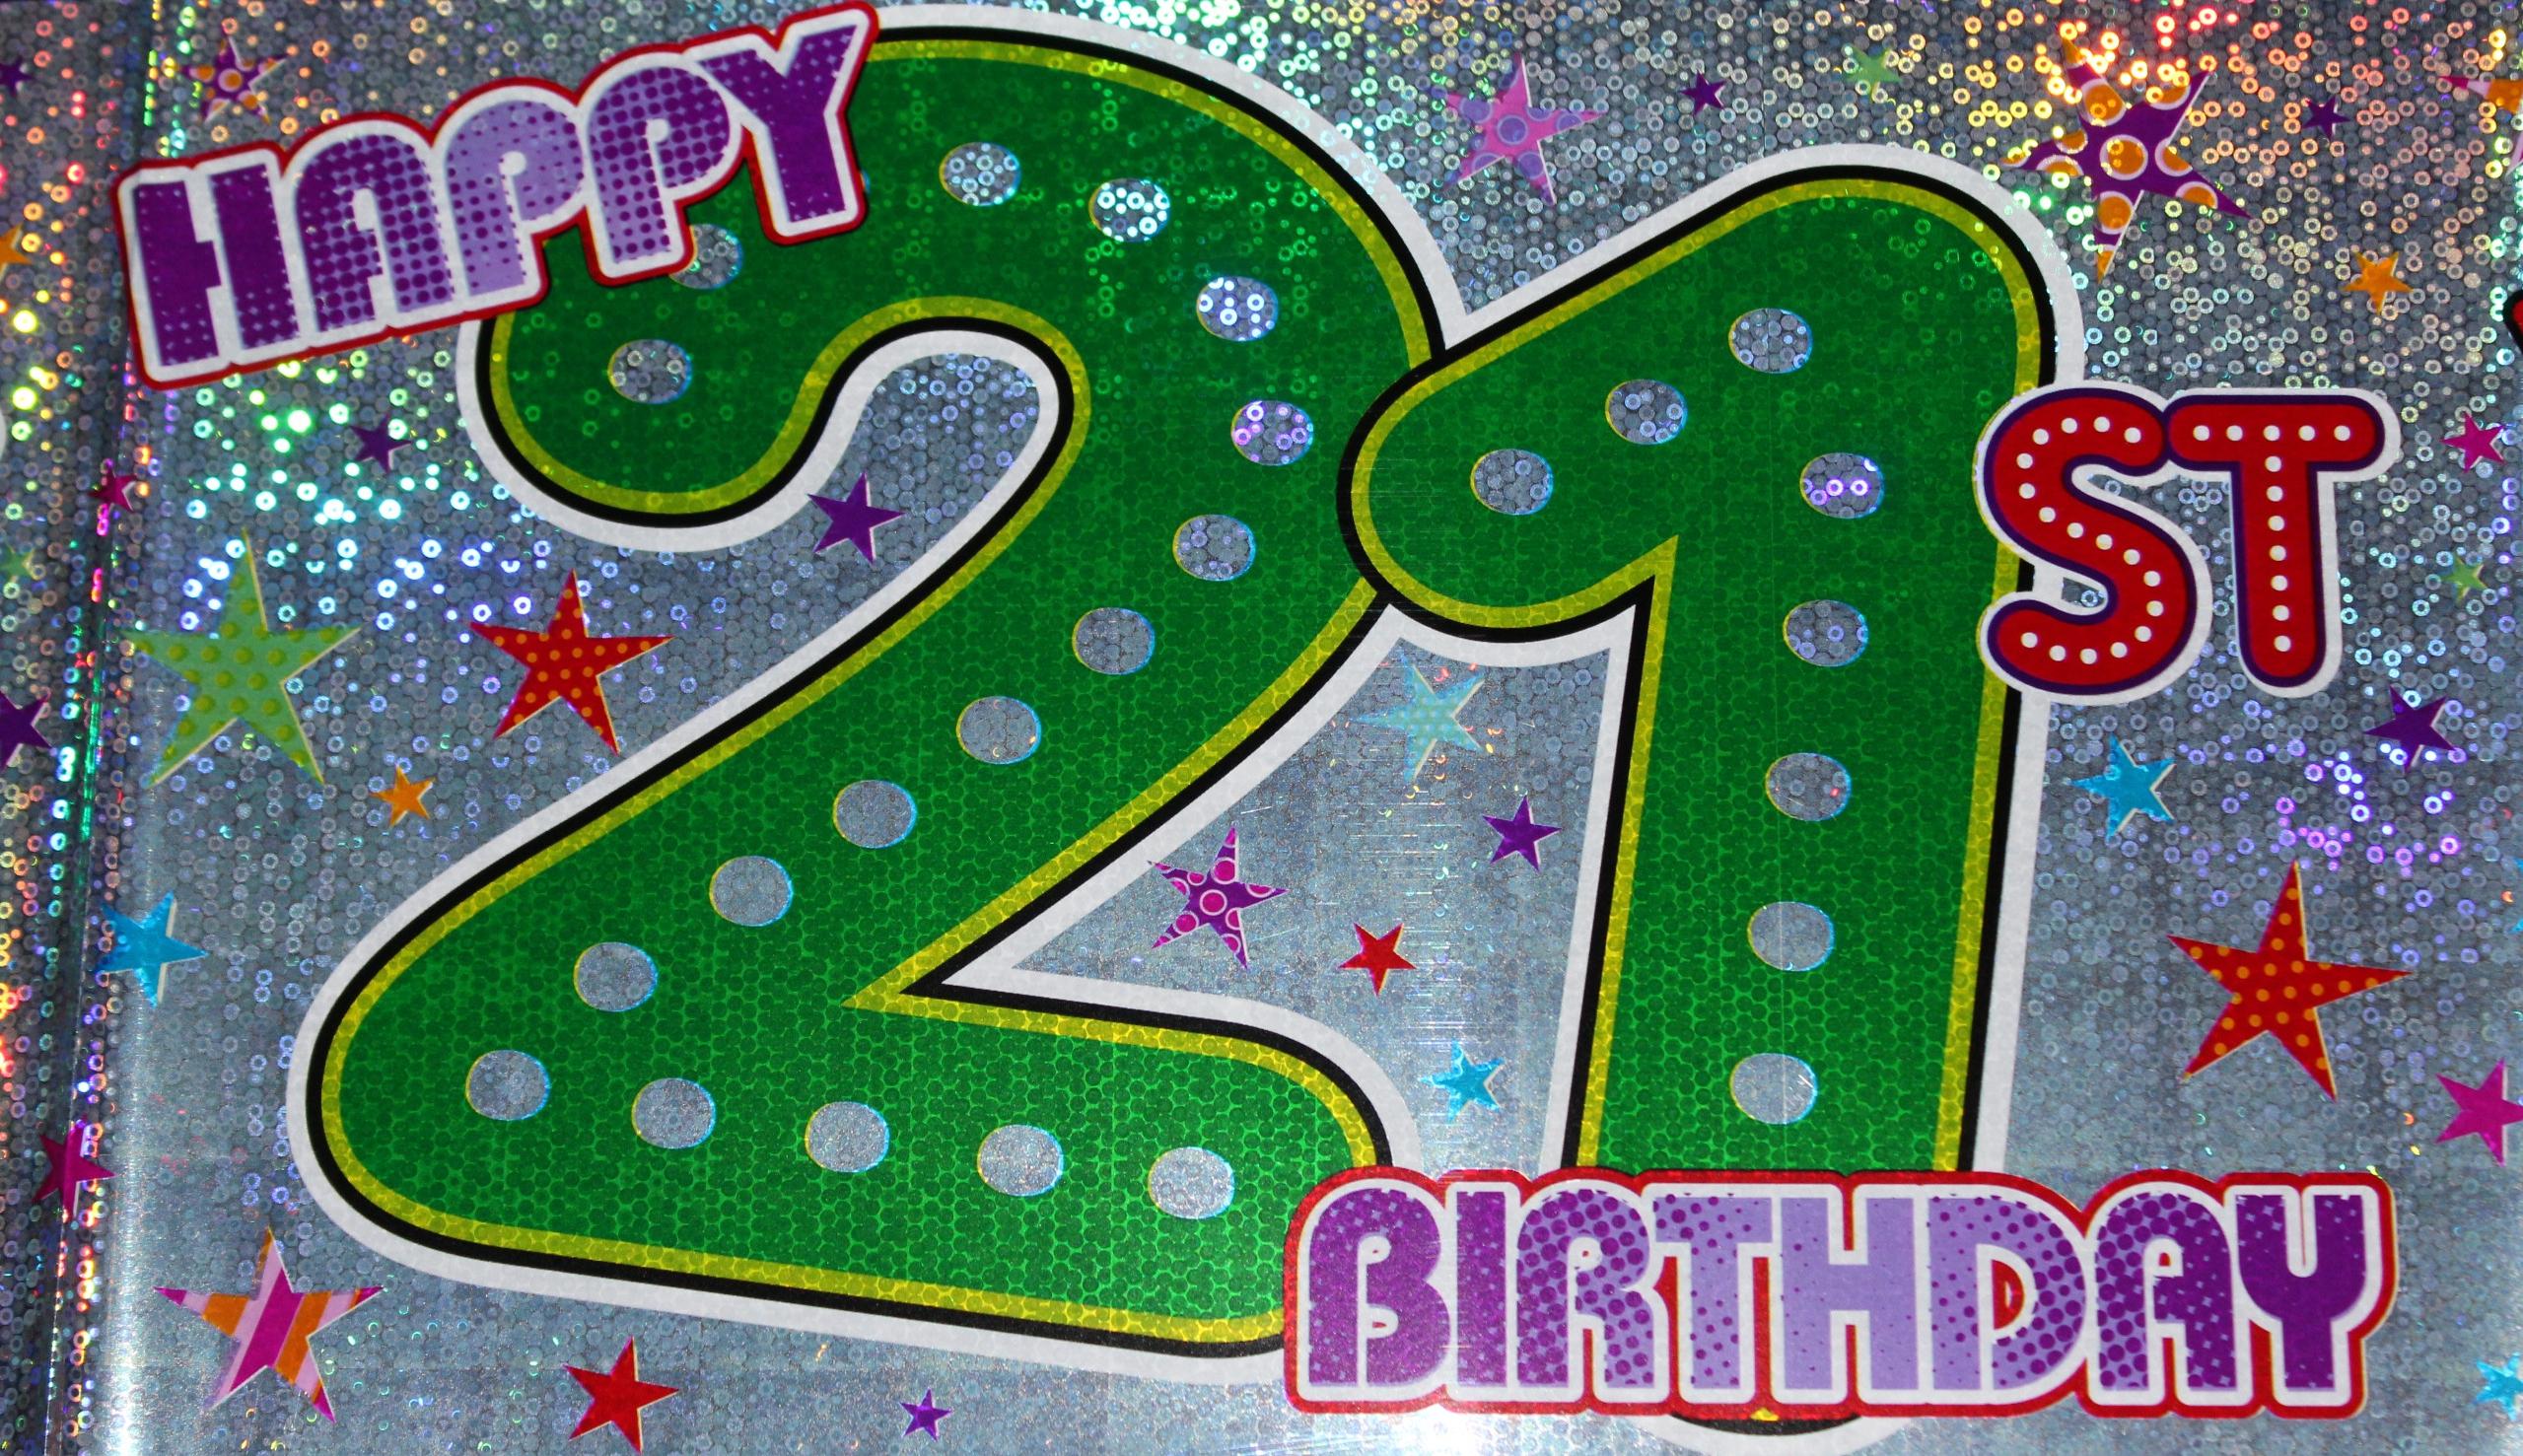 Joseph's 21st